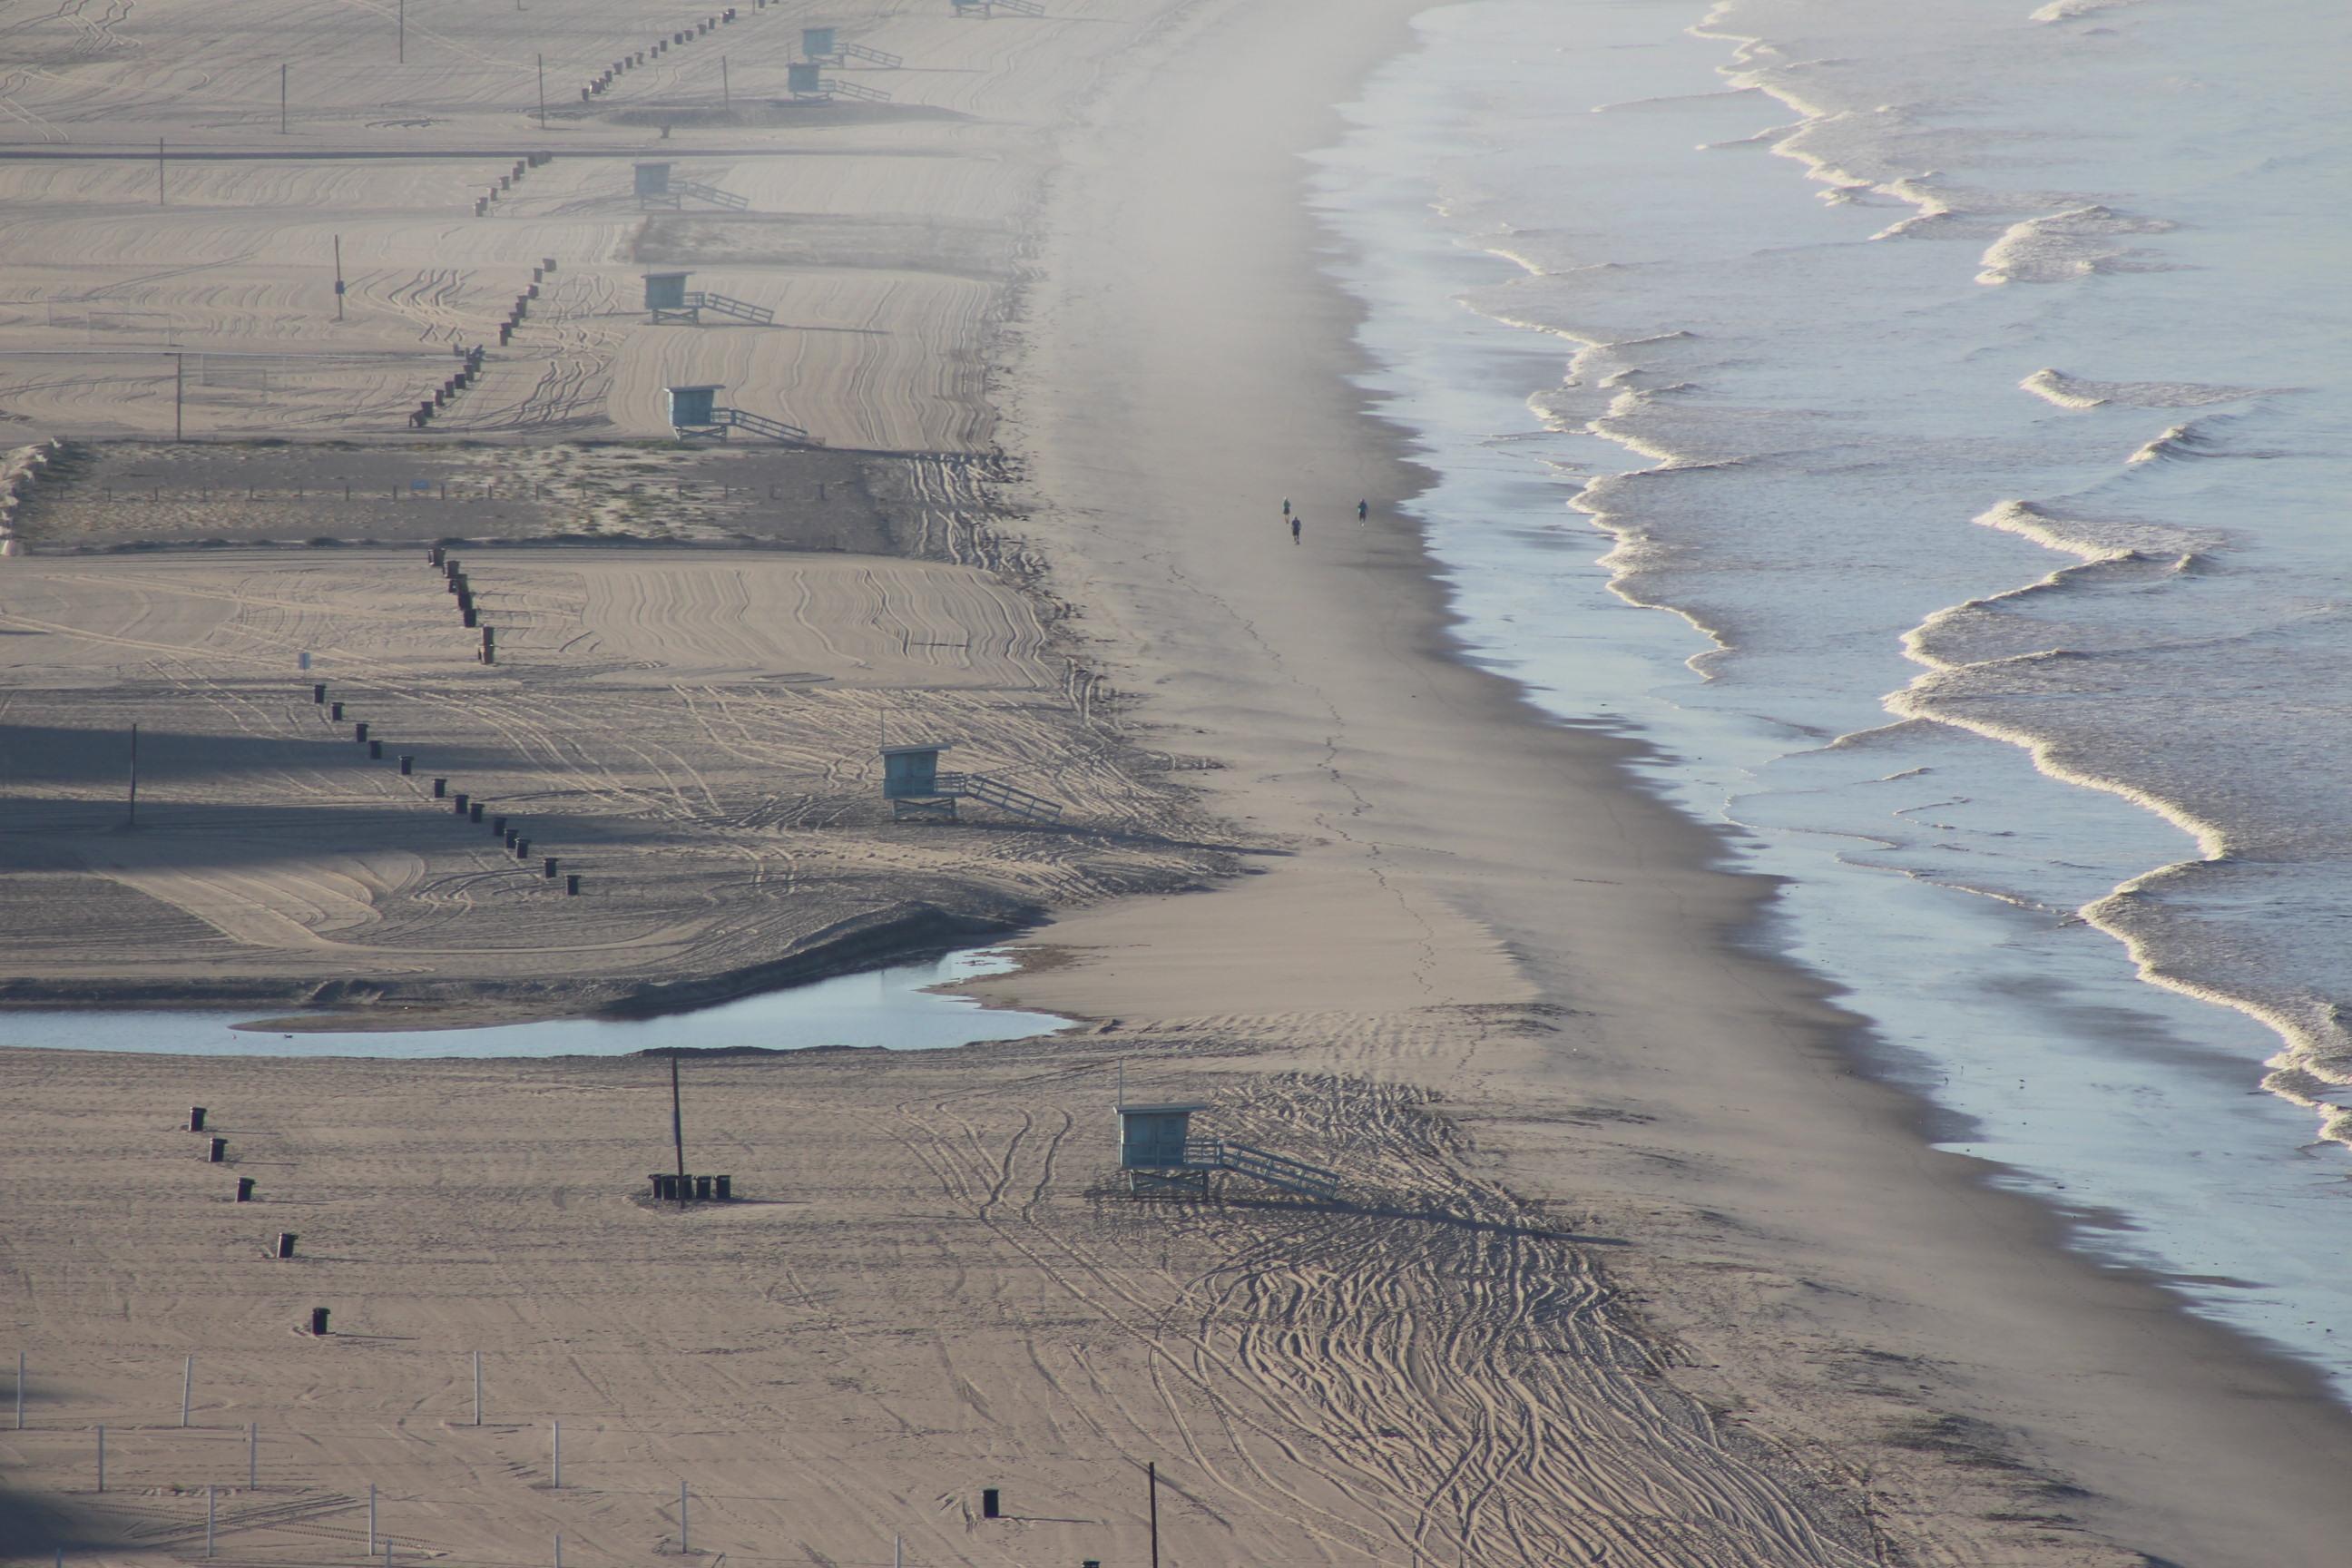 View of empty beach in Santa Monica on May 9, 2020 | Karen Foshay